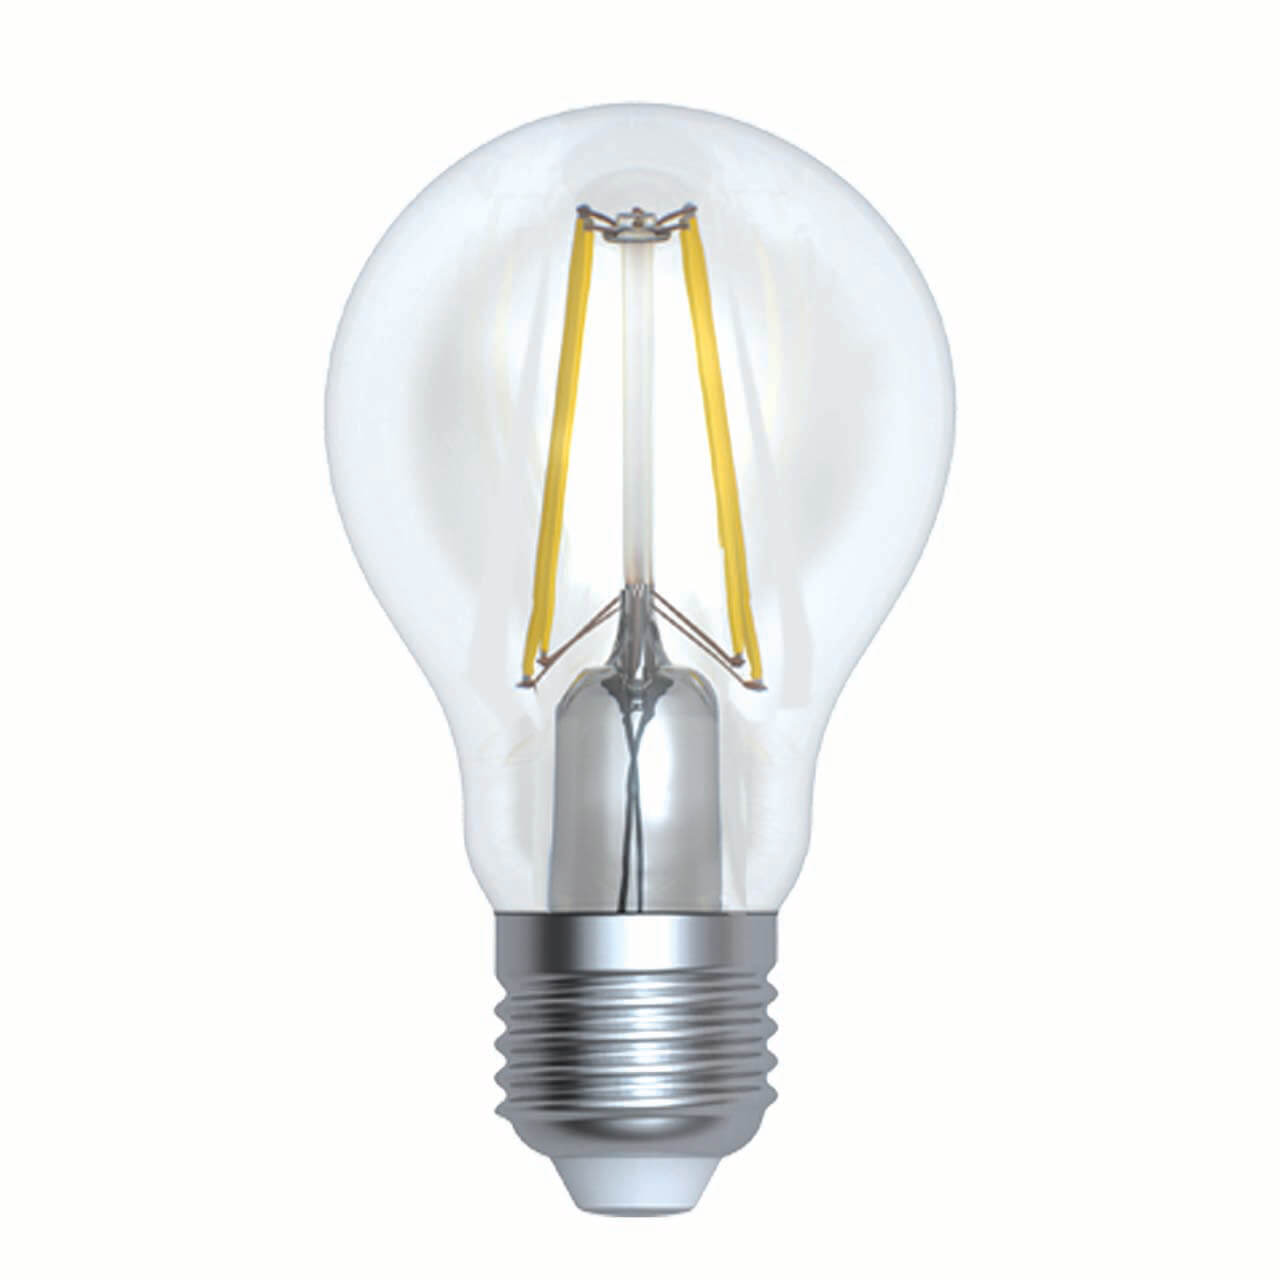 Фото - Лампочка Uniel LED-A60-15W/3000K/E27/CL PLS02WH LED-A60 лампочка uniel led a60 10w ww e27 cl pls02wh sky